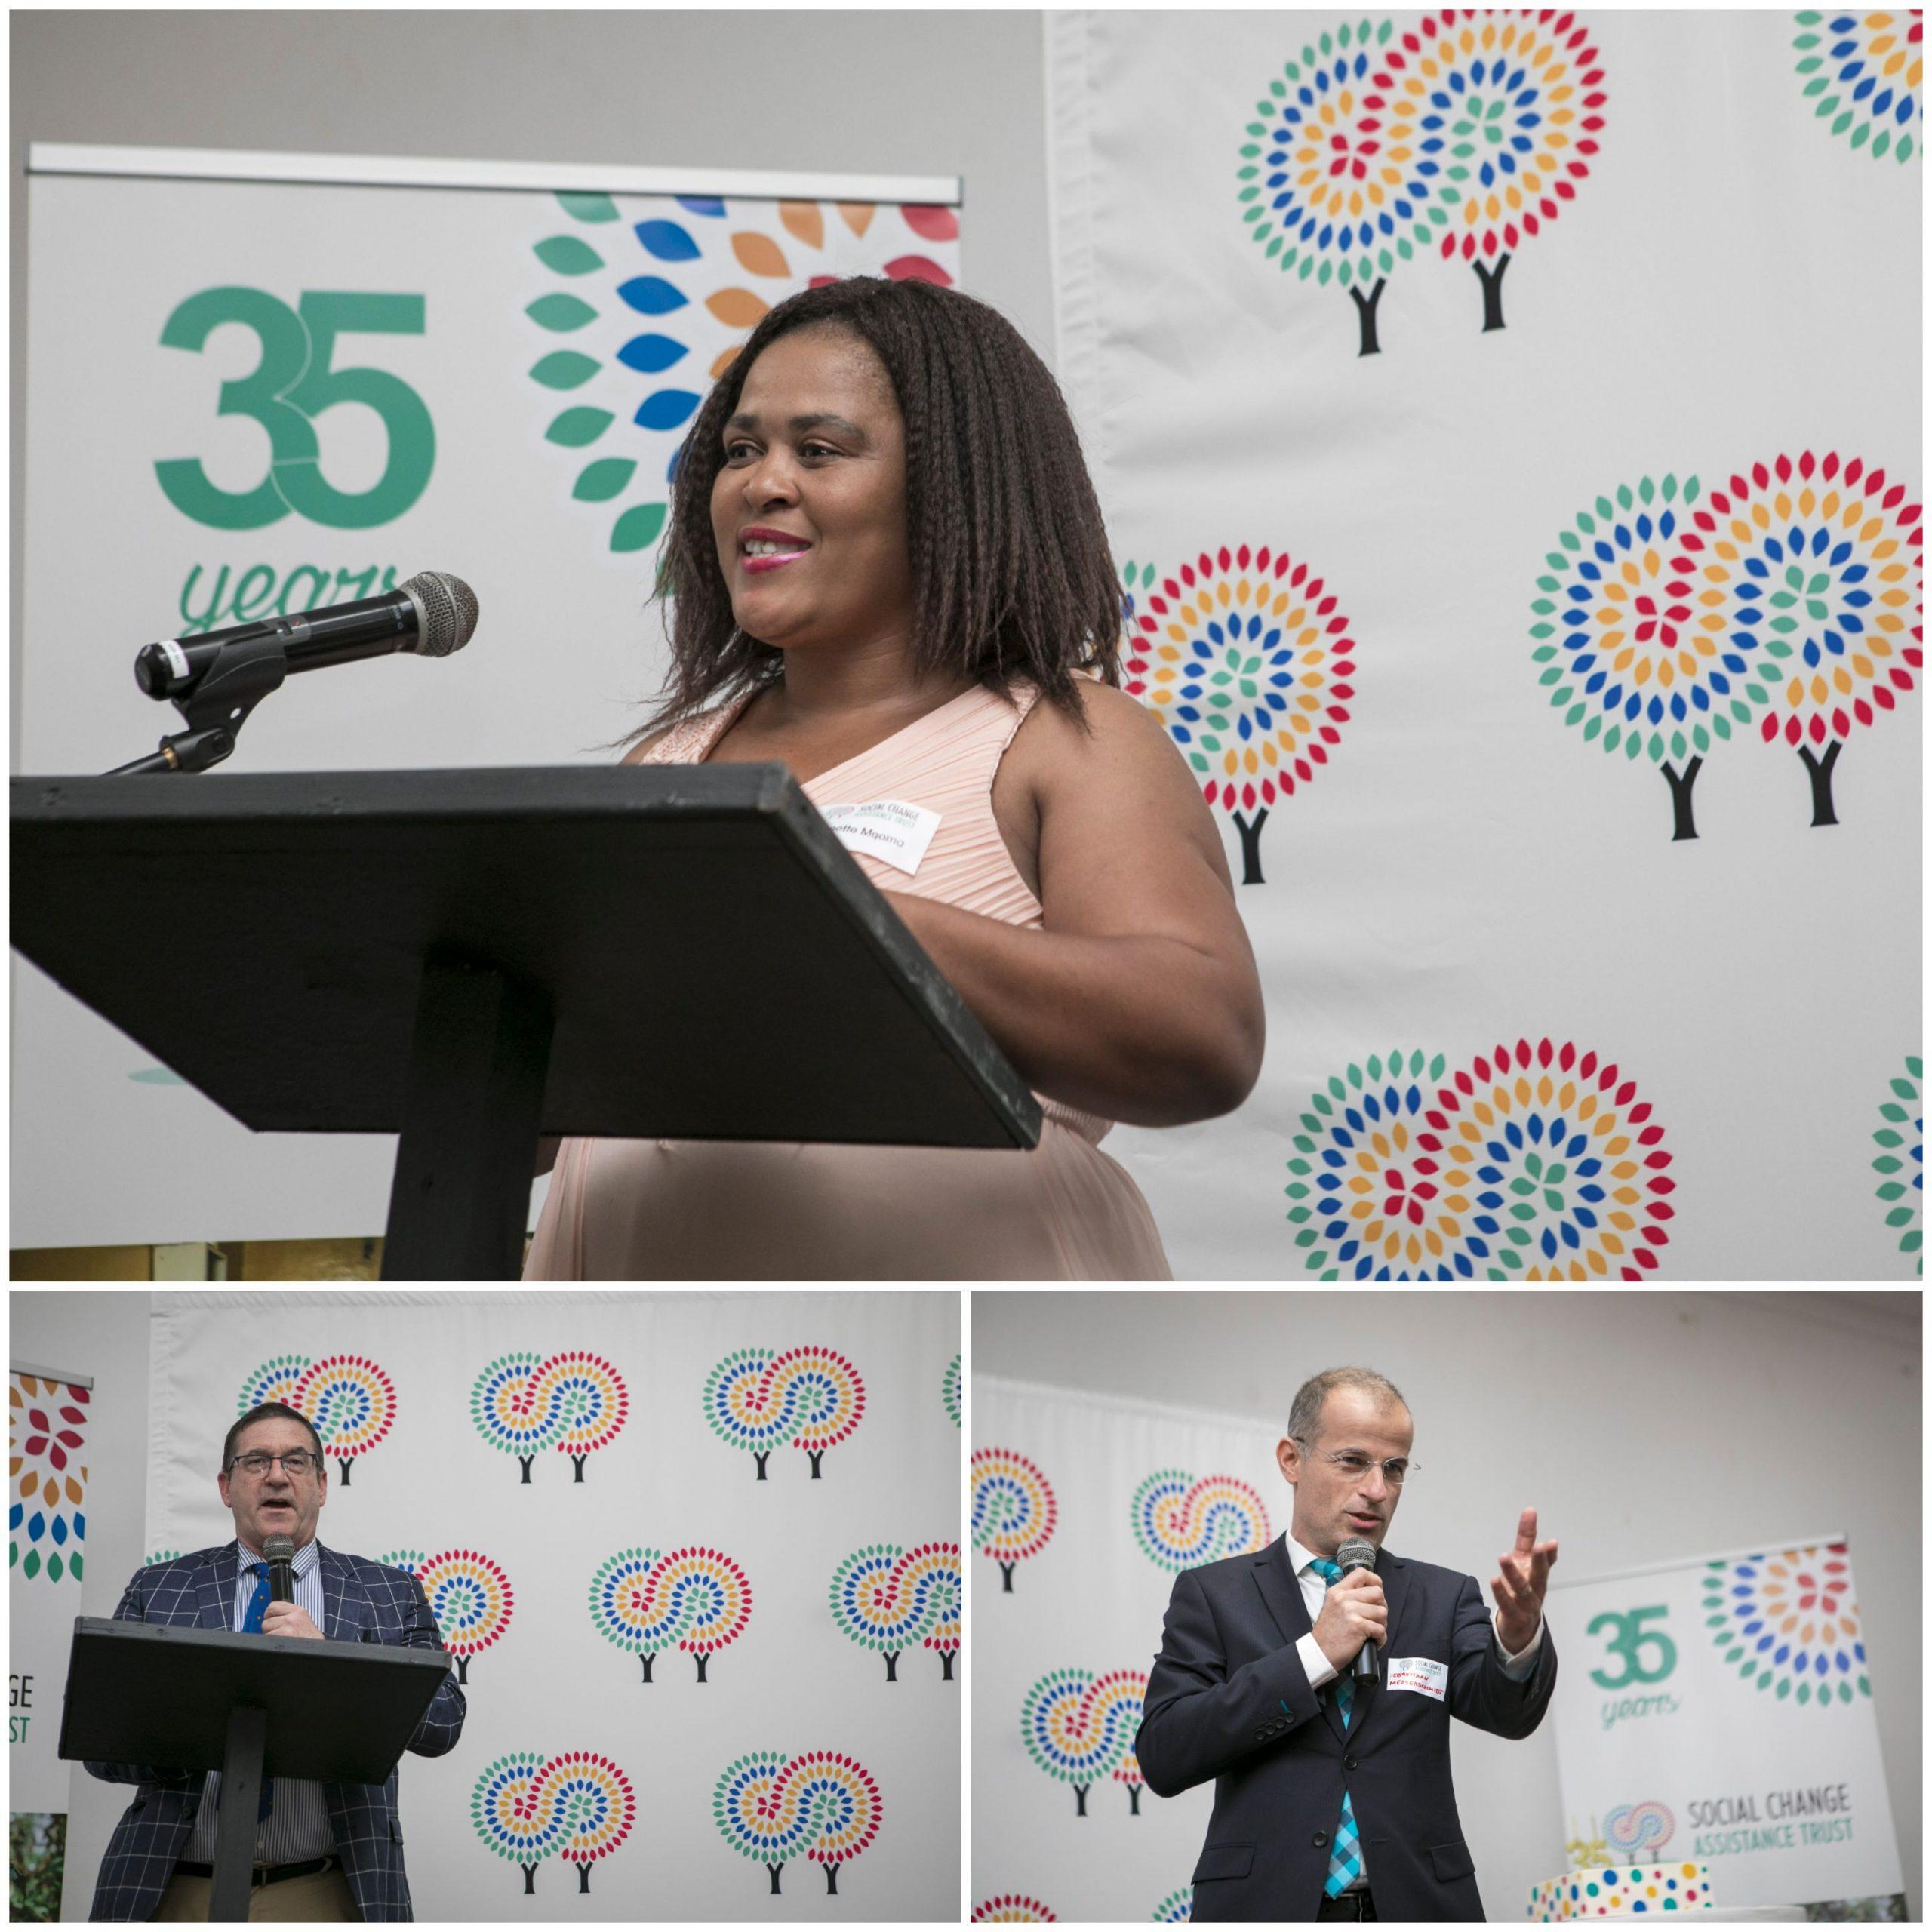 speakers 35th anniversary celebration